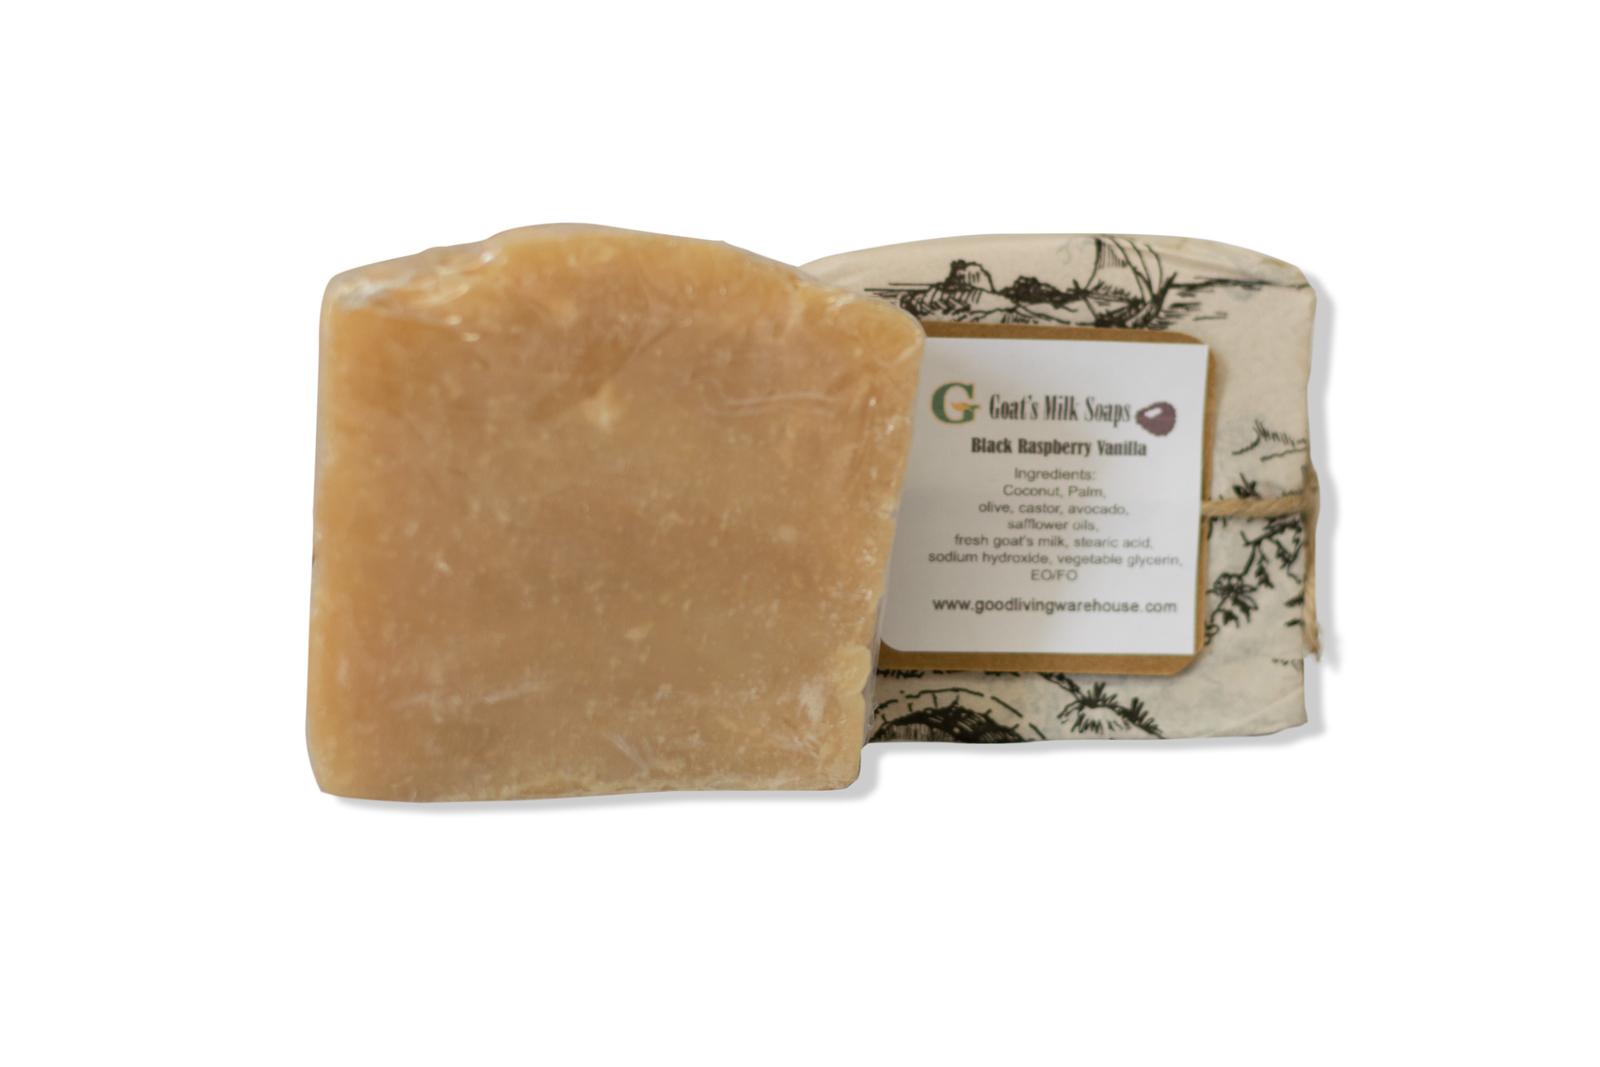 Handcrafted Natural Goat's Milk Soap - Black Raspberry Vanilla - Large (5 oz)